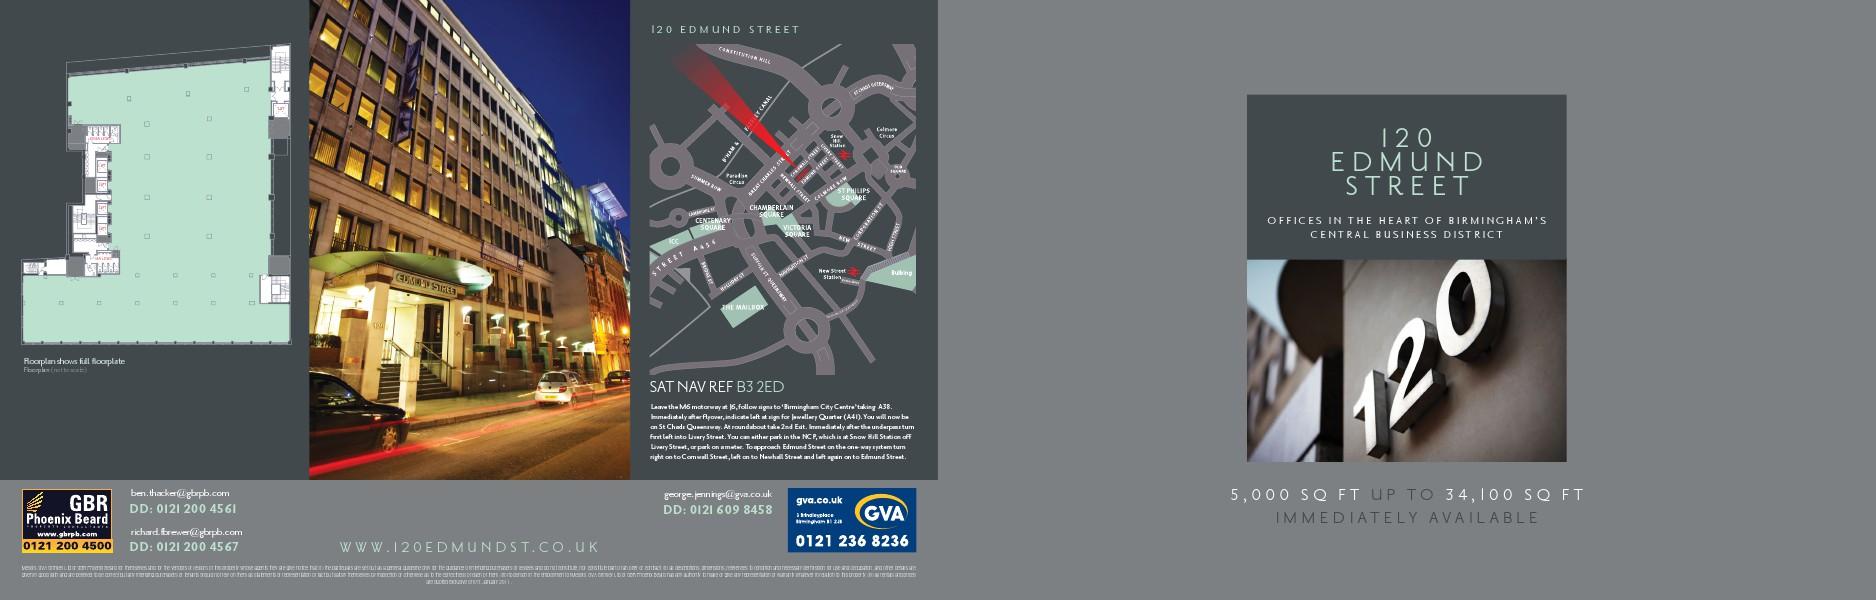 Office space to rent across the UK 120 Edmund Street, Birmingham